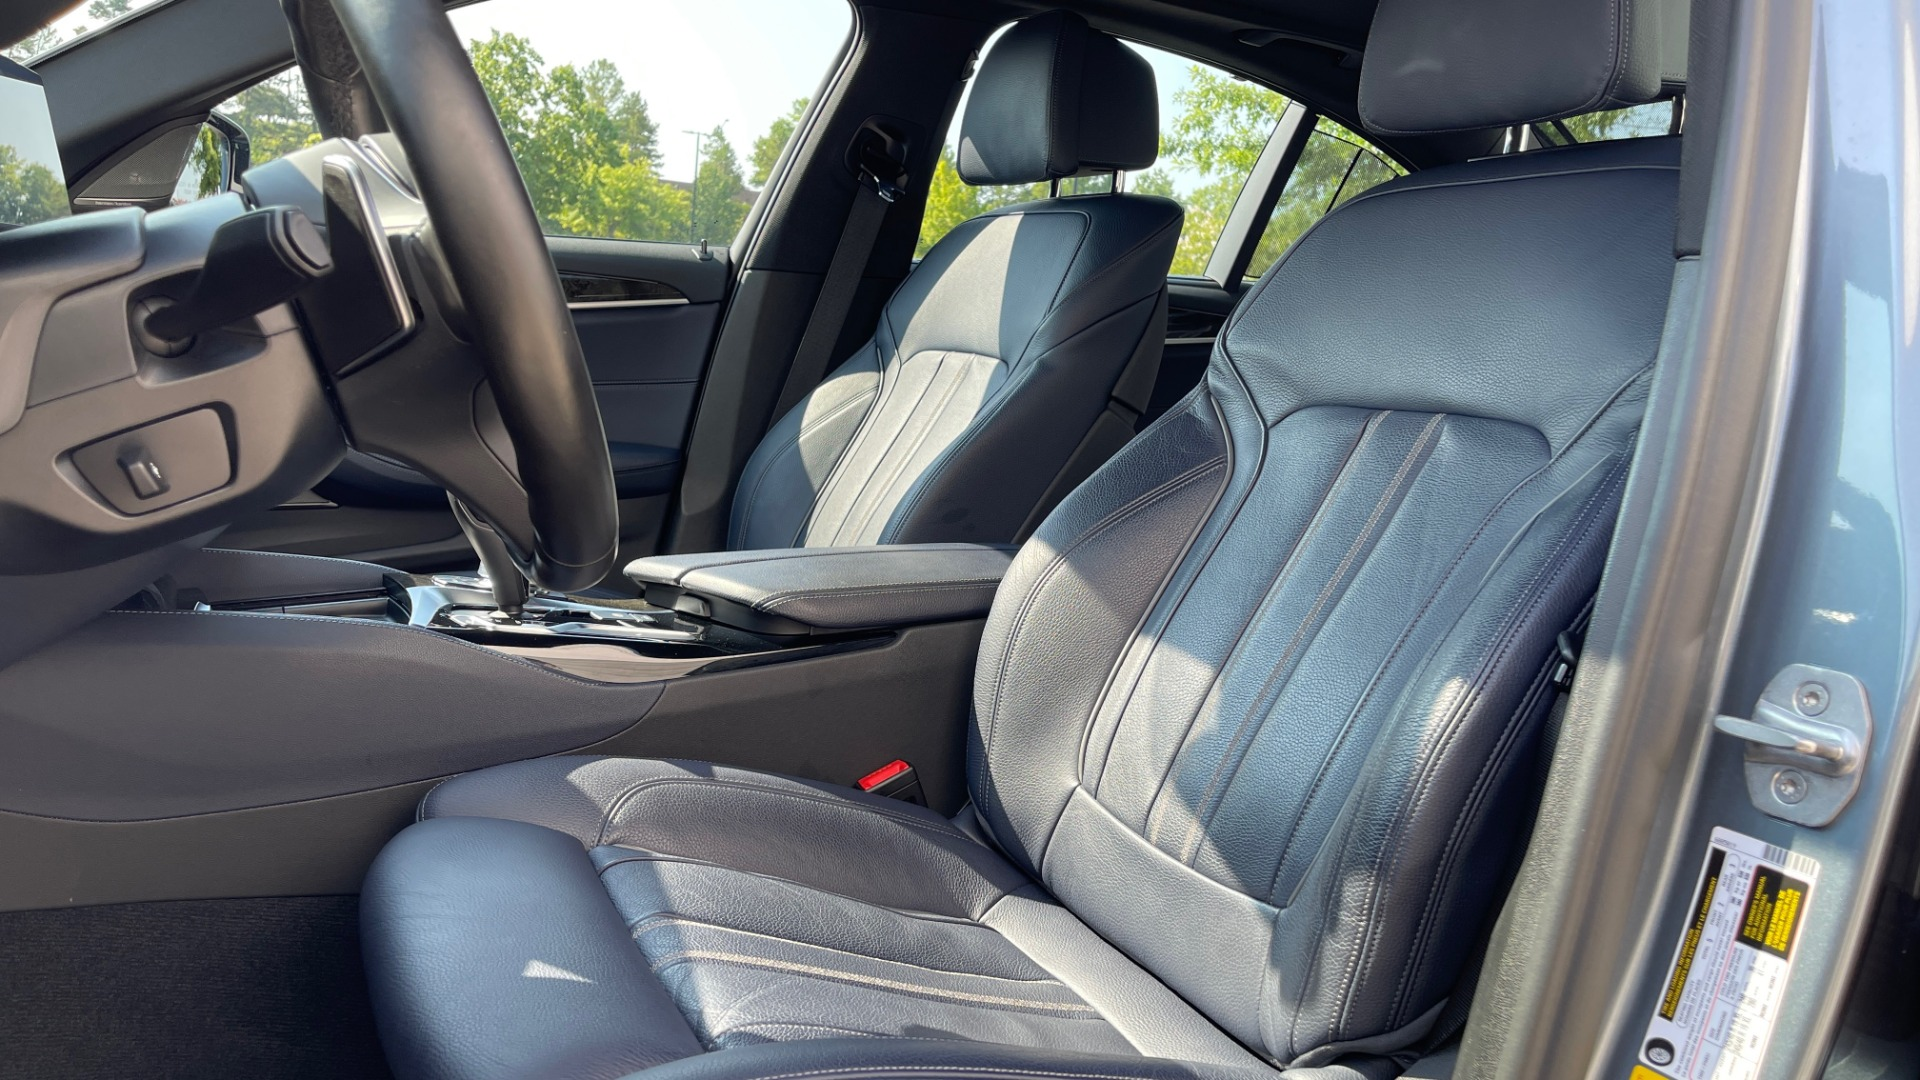 Used 2018 BMW 5 SERIES 540I XDRIVE M-SPORT / DRVR ASST / PDC / APPLE / HUD / H/K SND for sale $42,795 at Formula Imports in Charlotte NC 28227 29